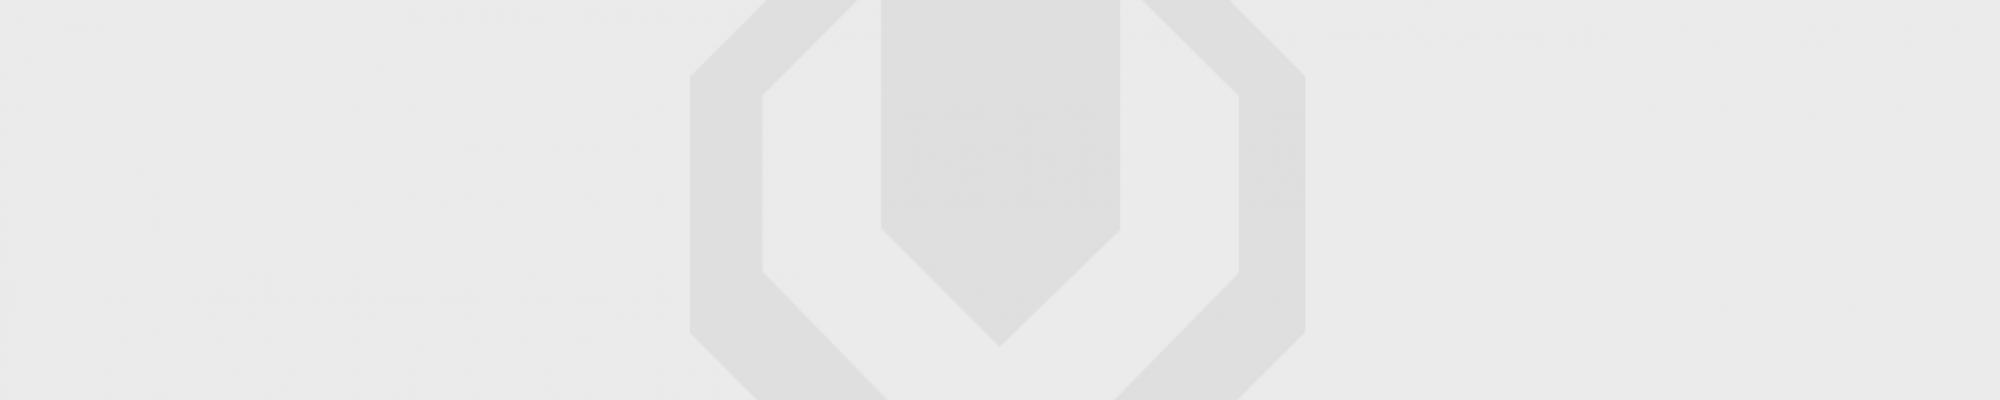 Light grey background with Vactagon V symbol on top